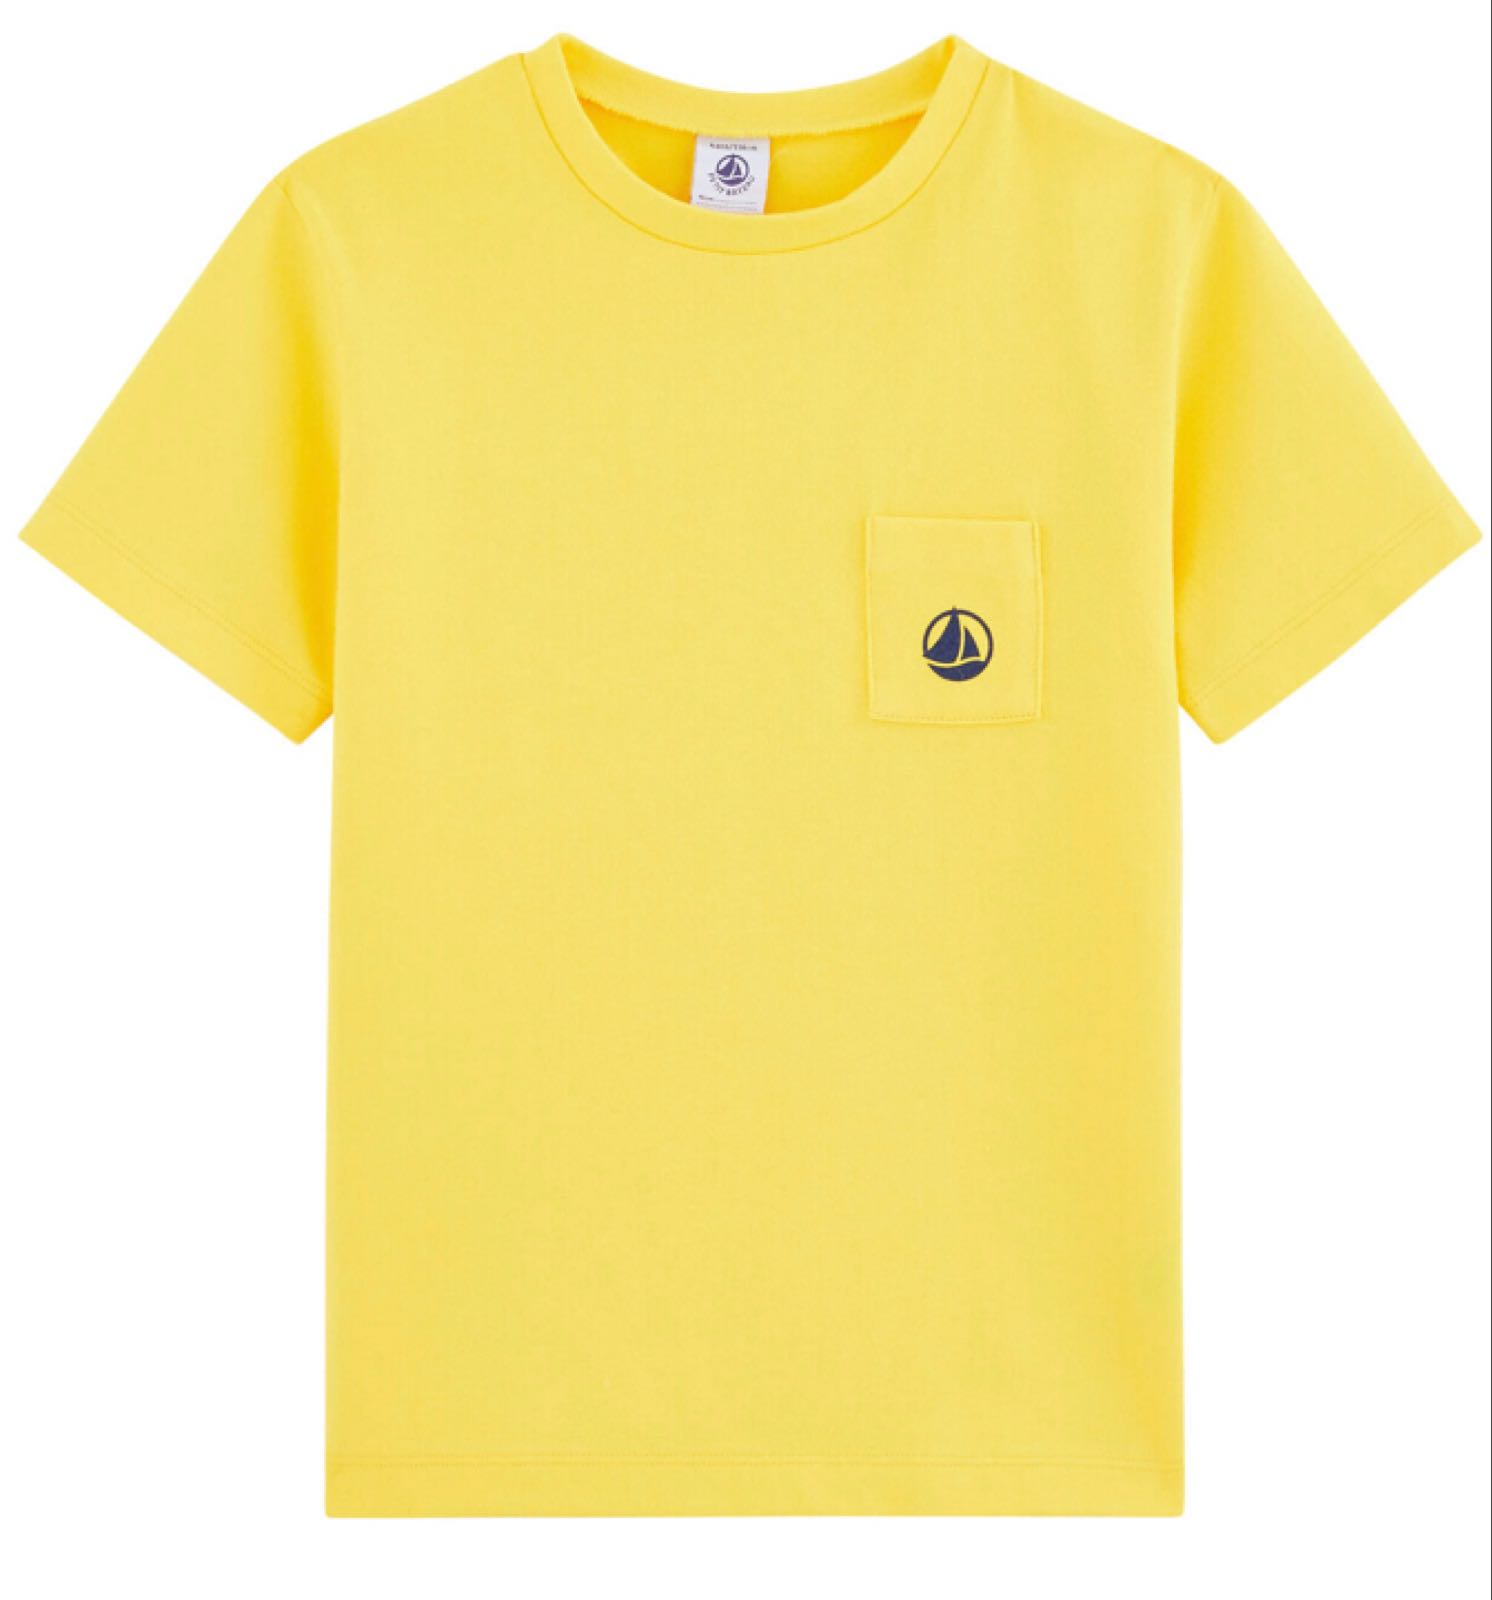 Petit Bateau Boys' Yellow T Shirt